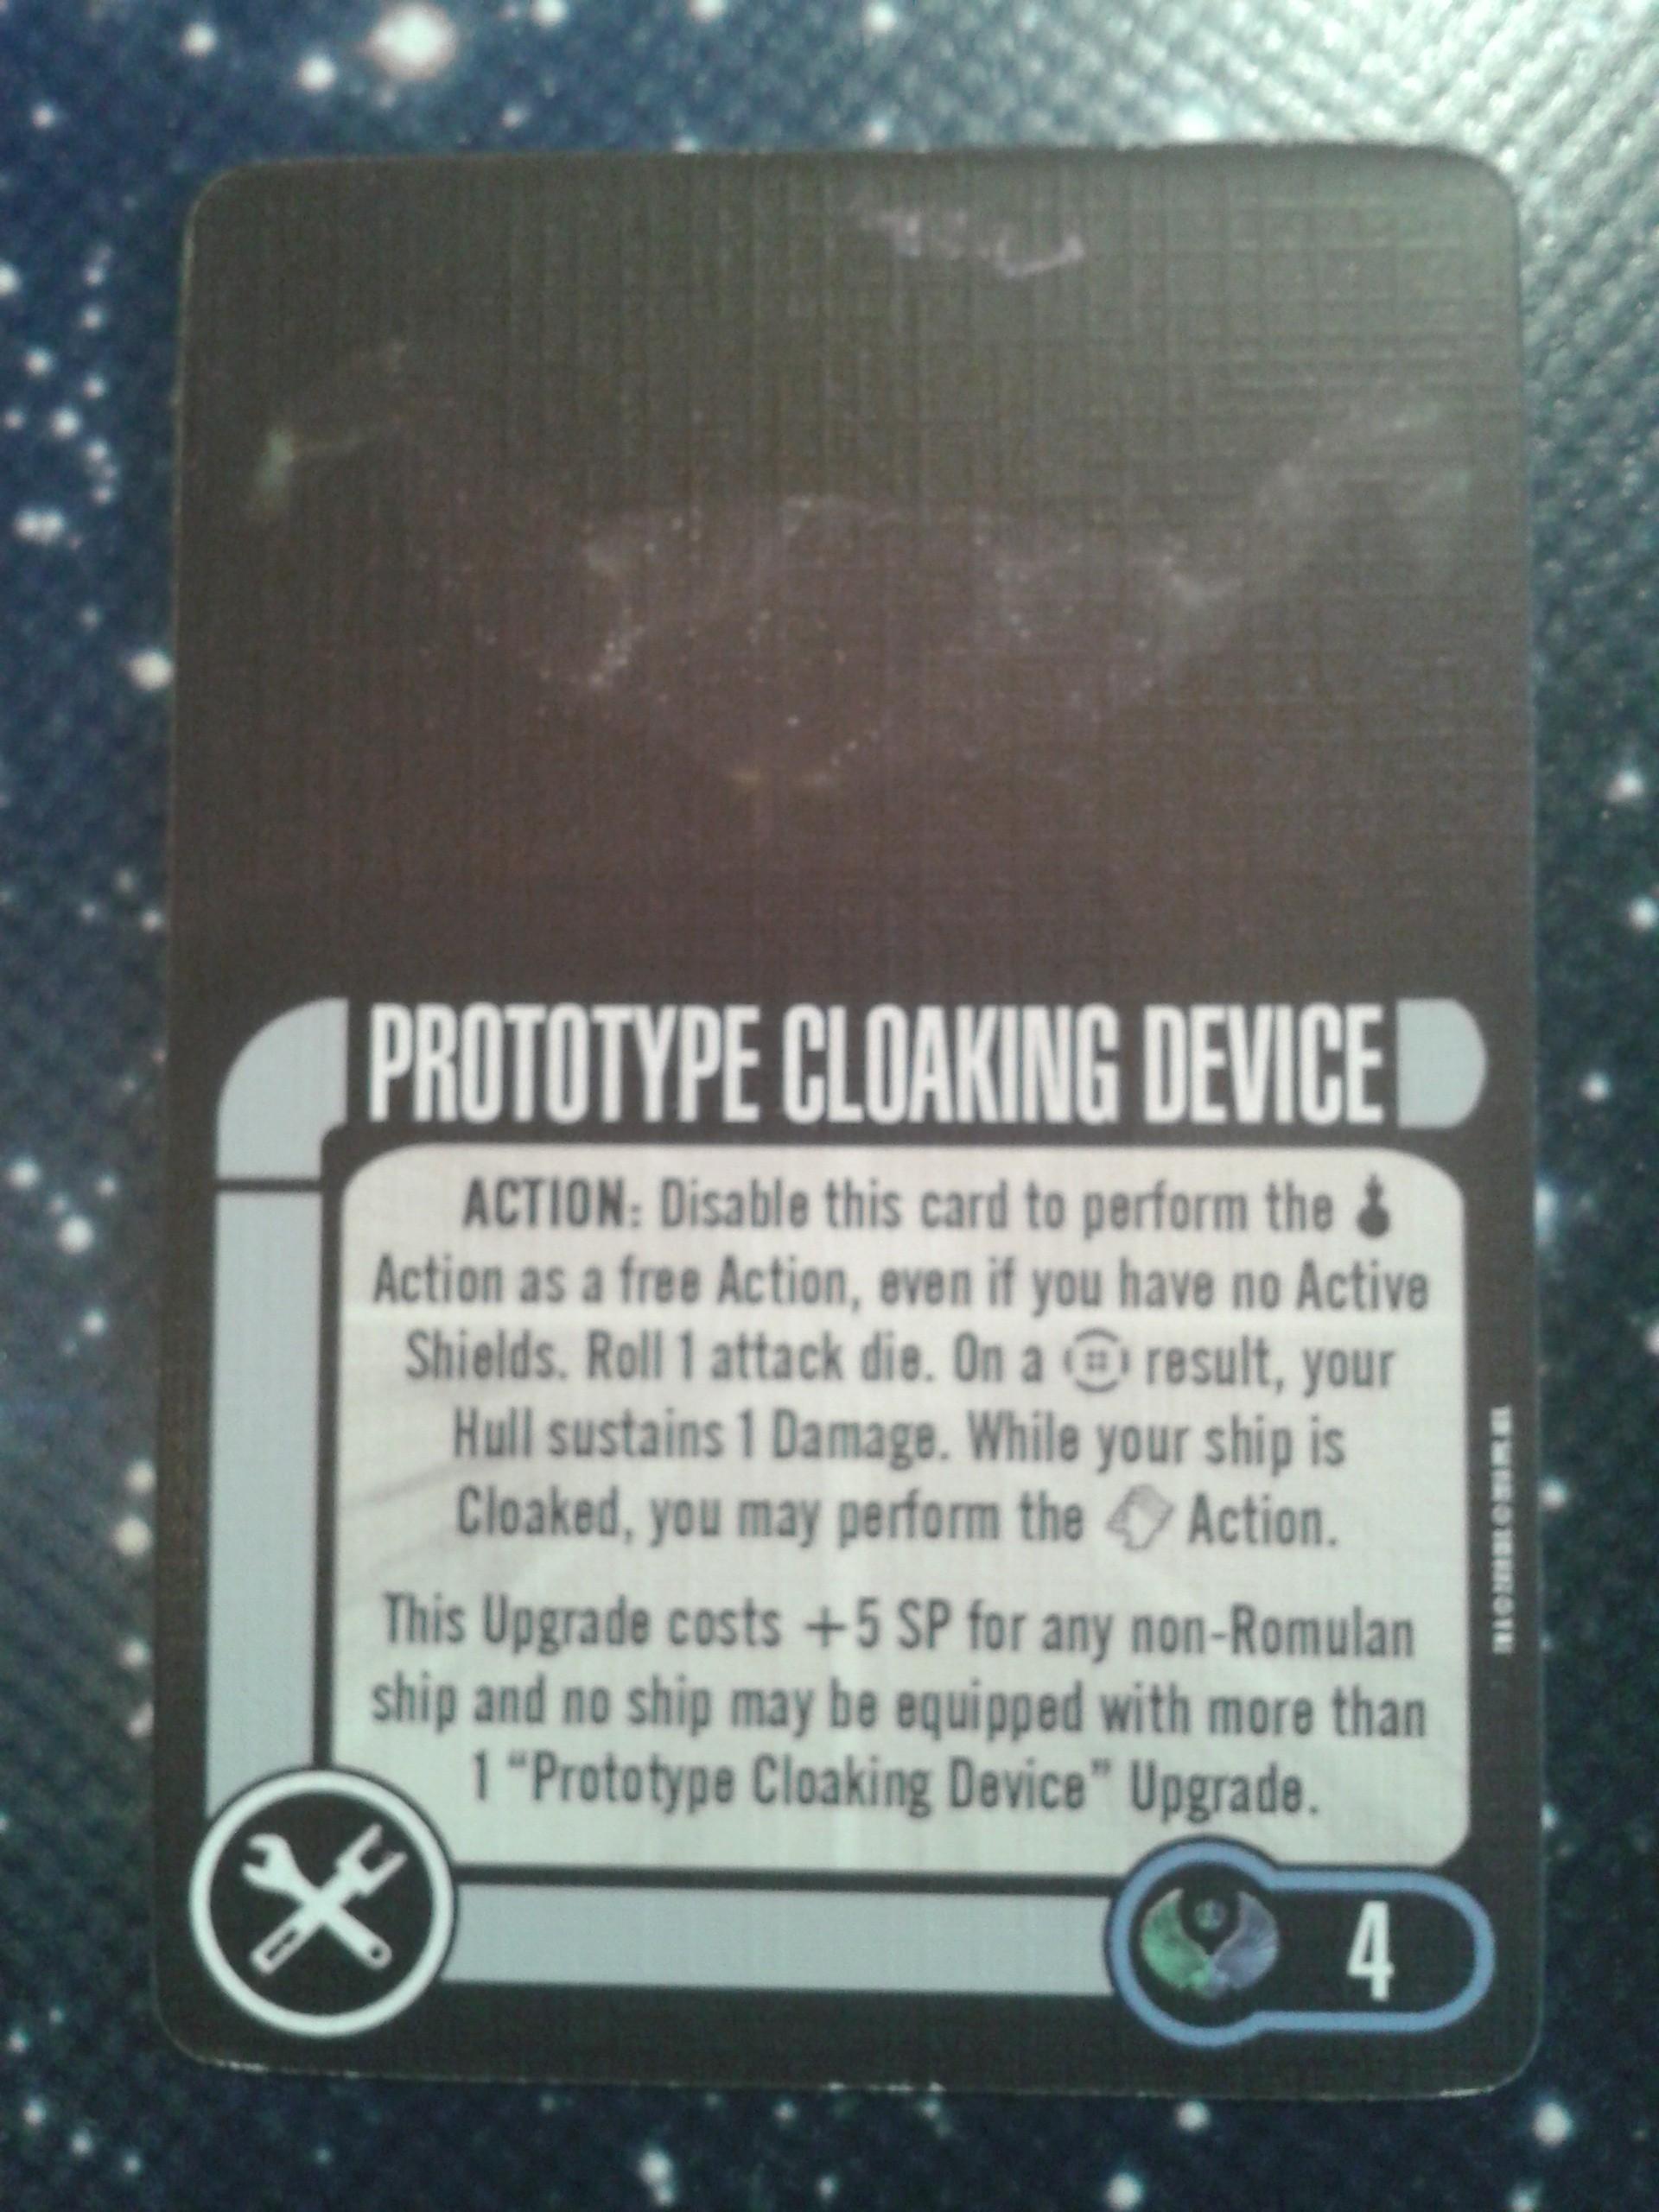 (Romulan) Protoype Cloacking Device 20160403_092817-e1459672998643